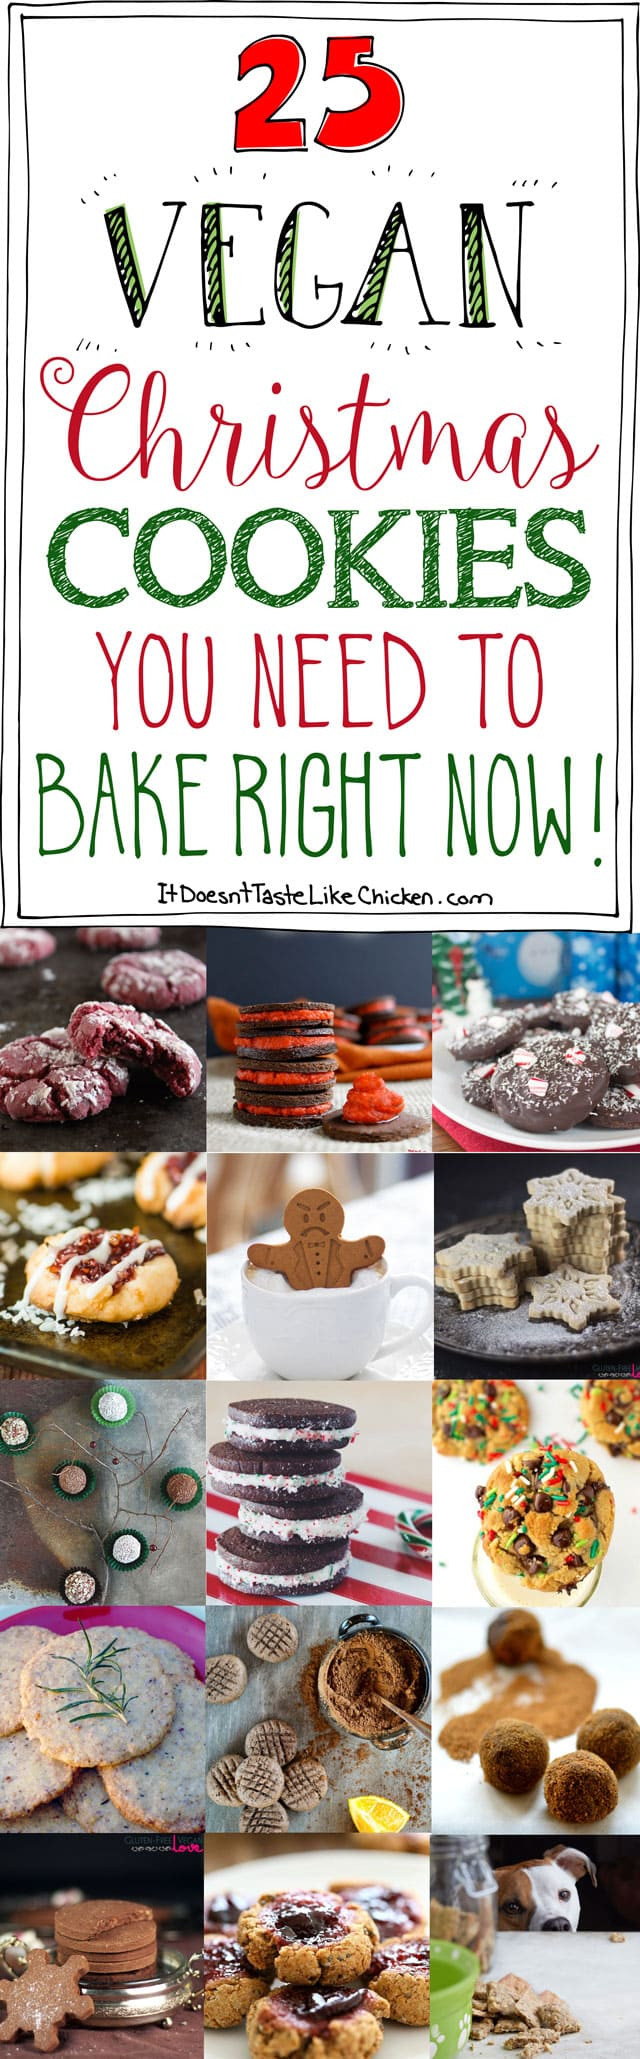 Best Vegan Christmas Cookies  25 Vegan Christmas Cookies You Need to Bake Right Now